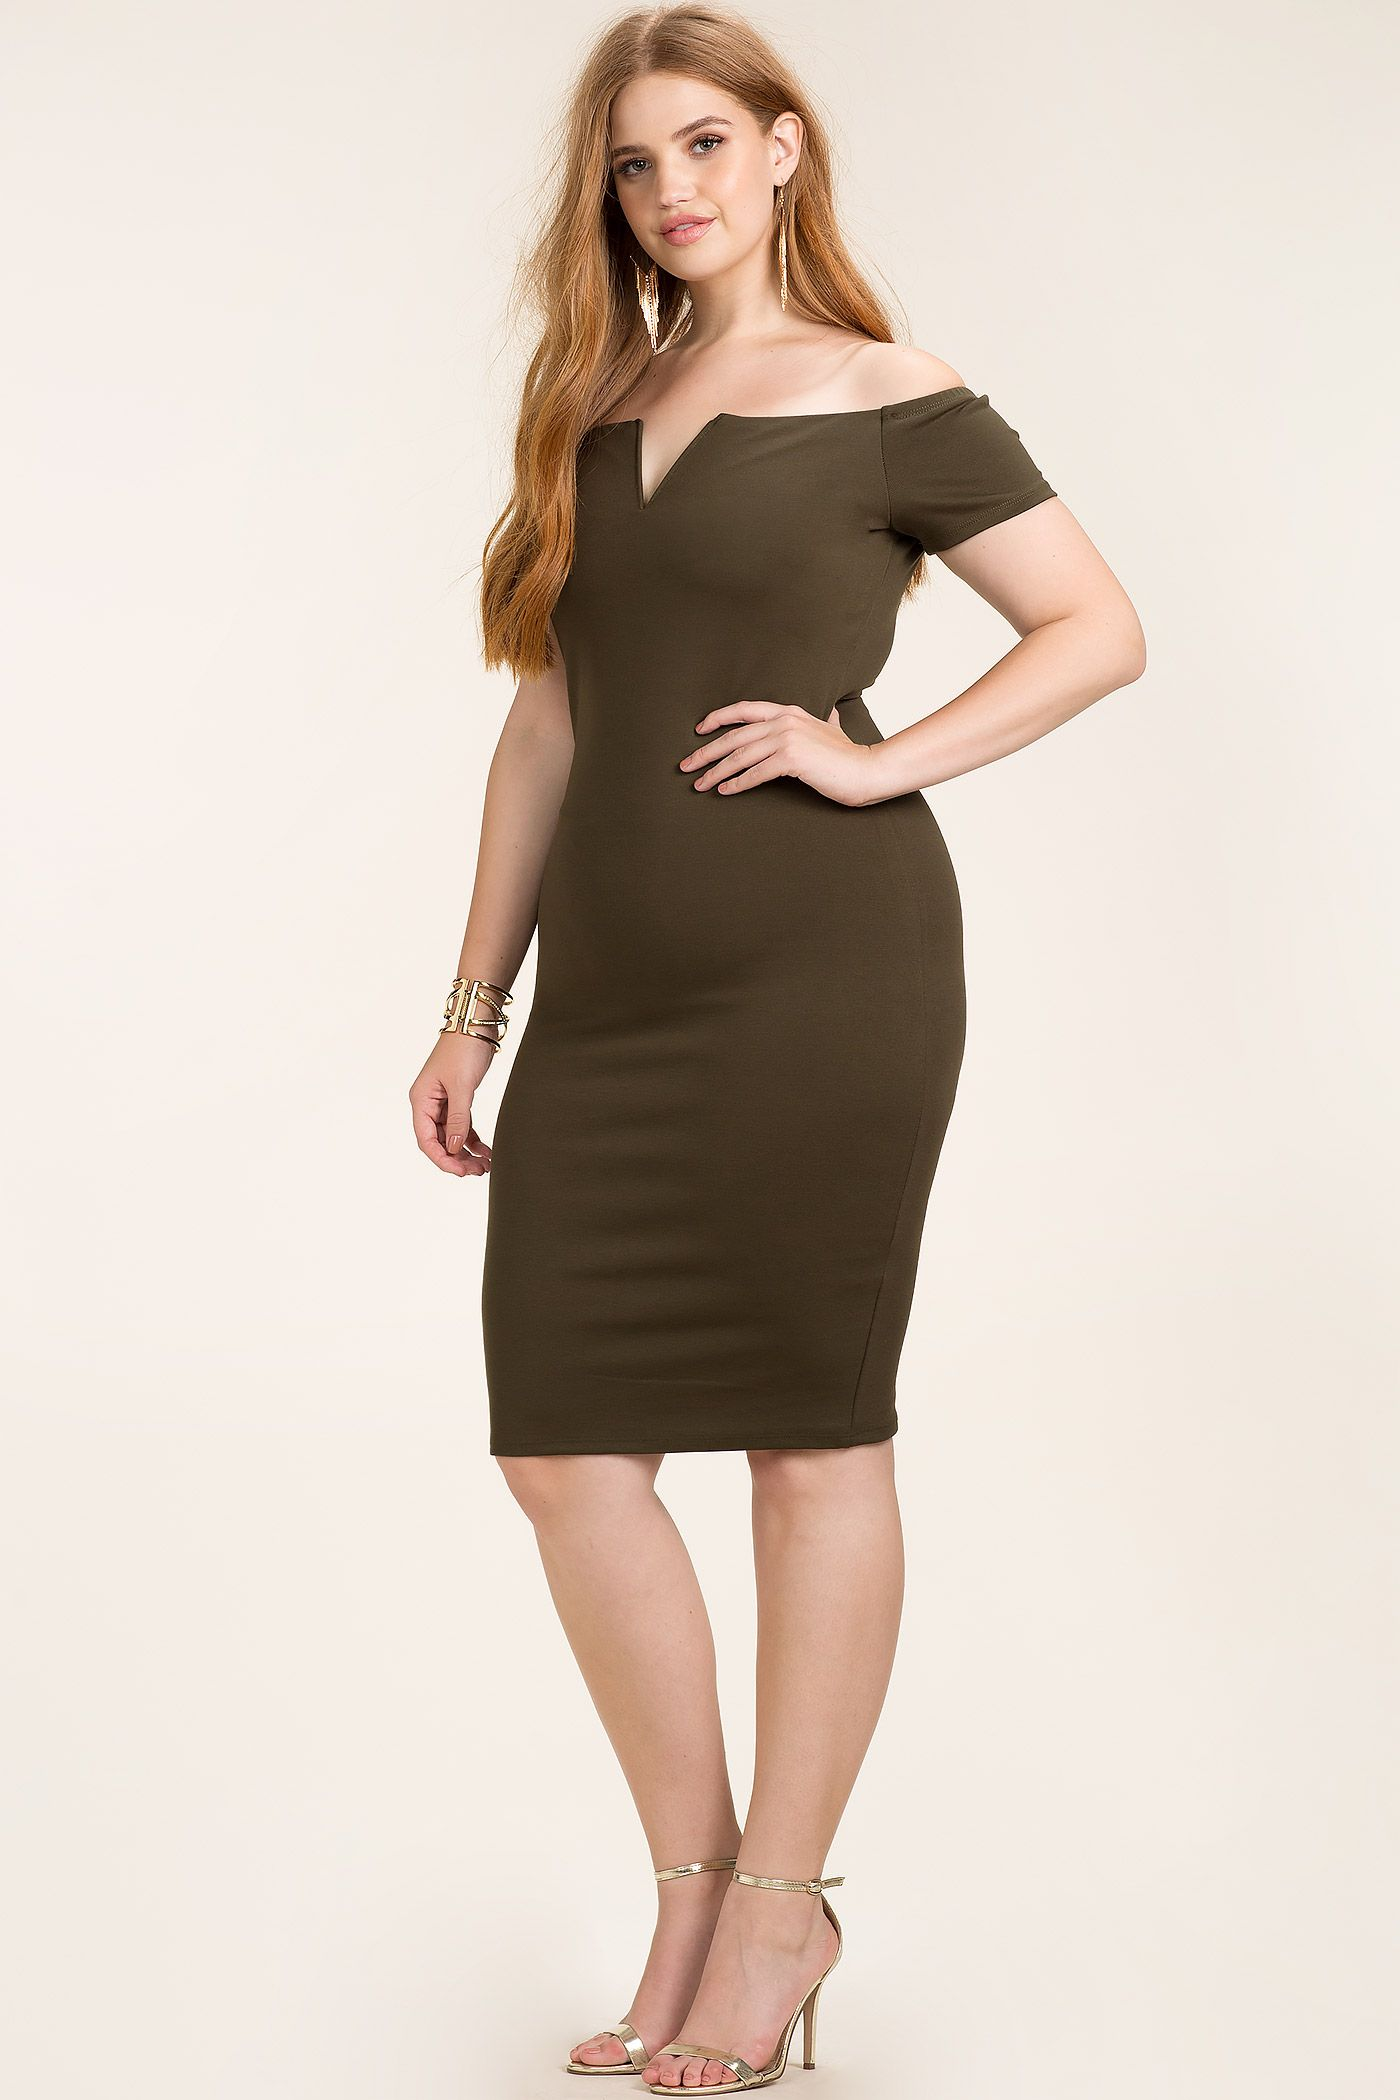 eb3bece5b0 Women s Plus Size Bodycon Dresses